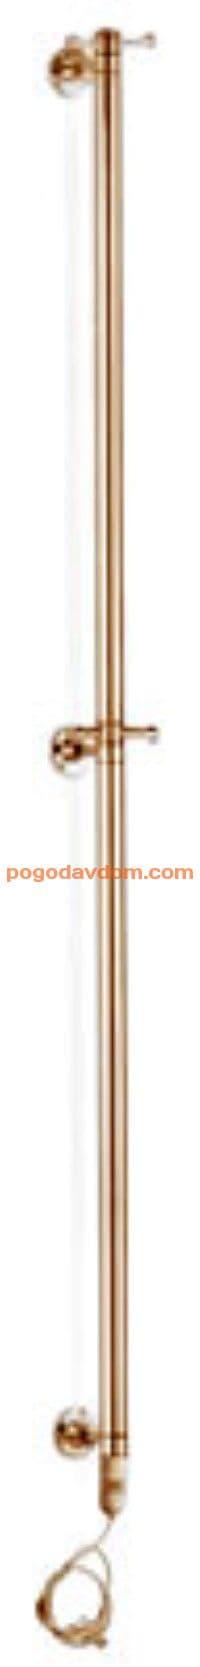 Margaroli модель Art.616/1650 Box хром